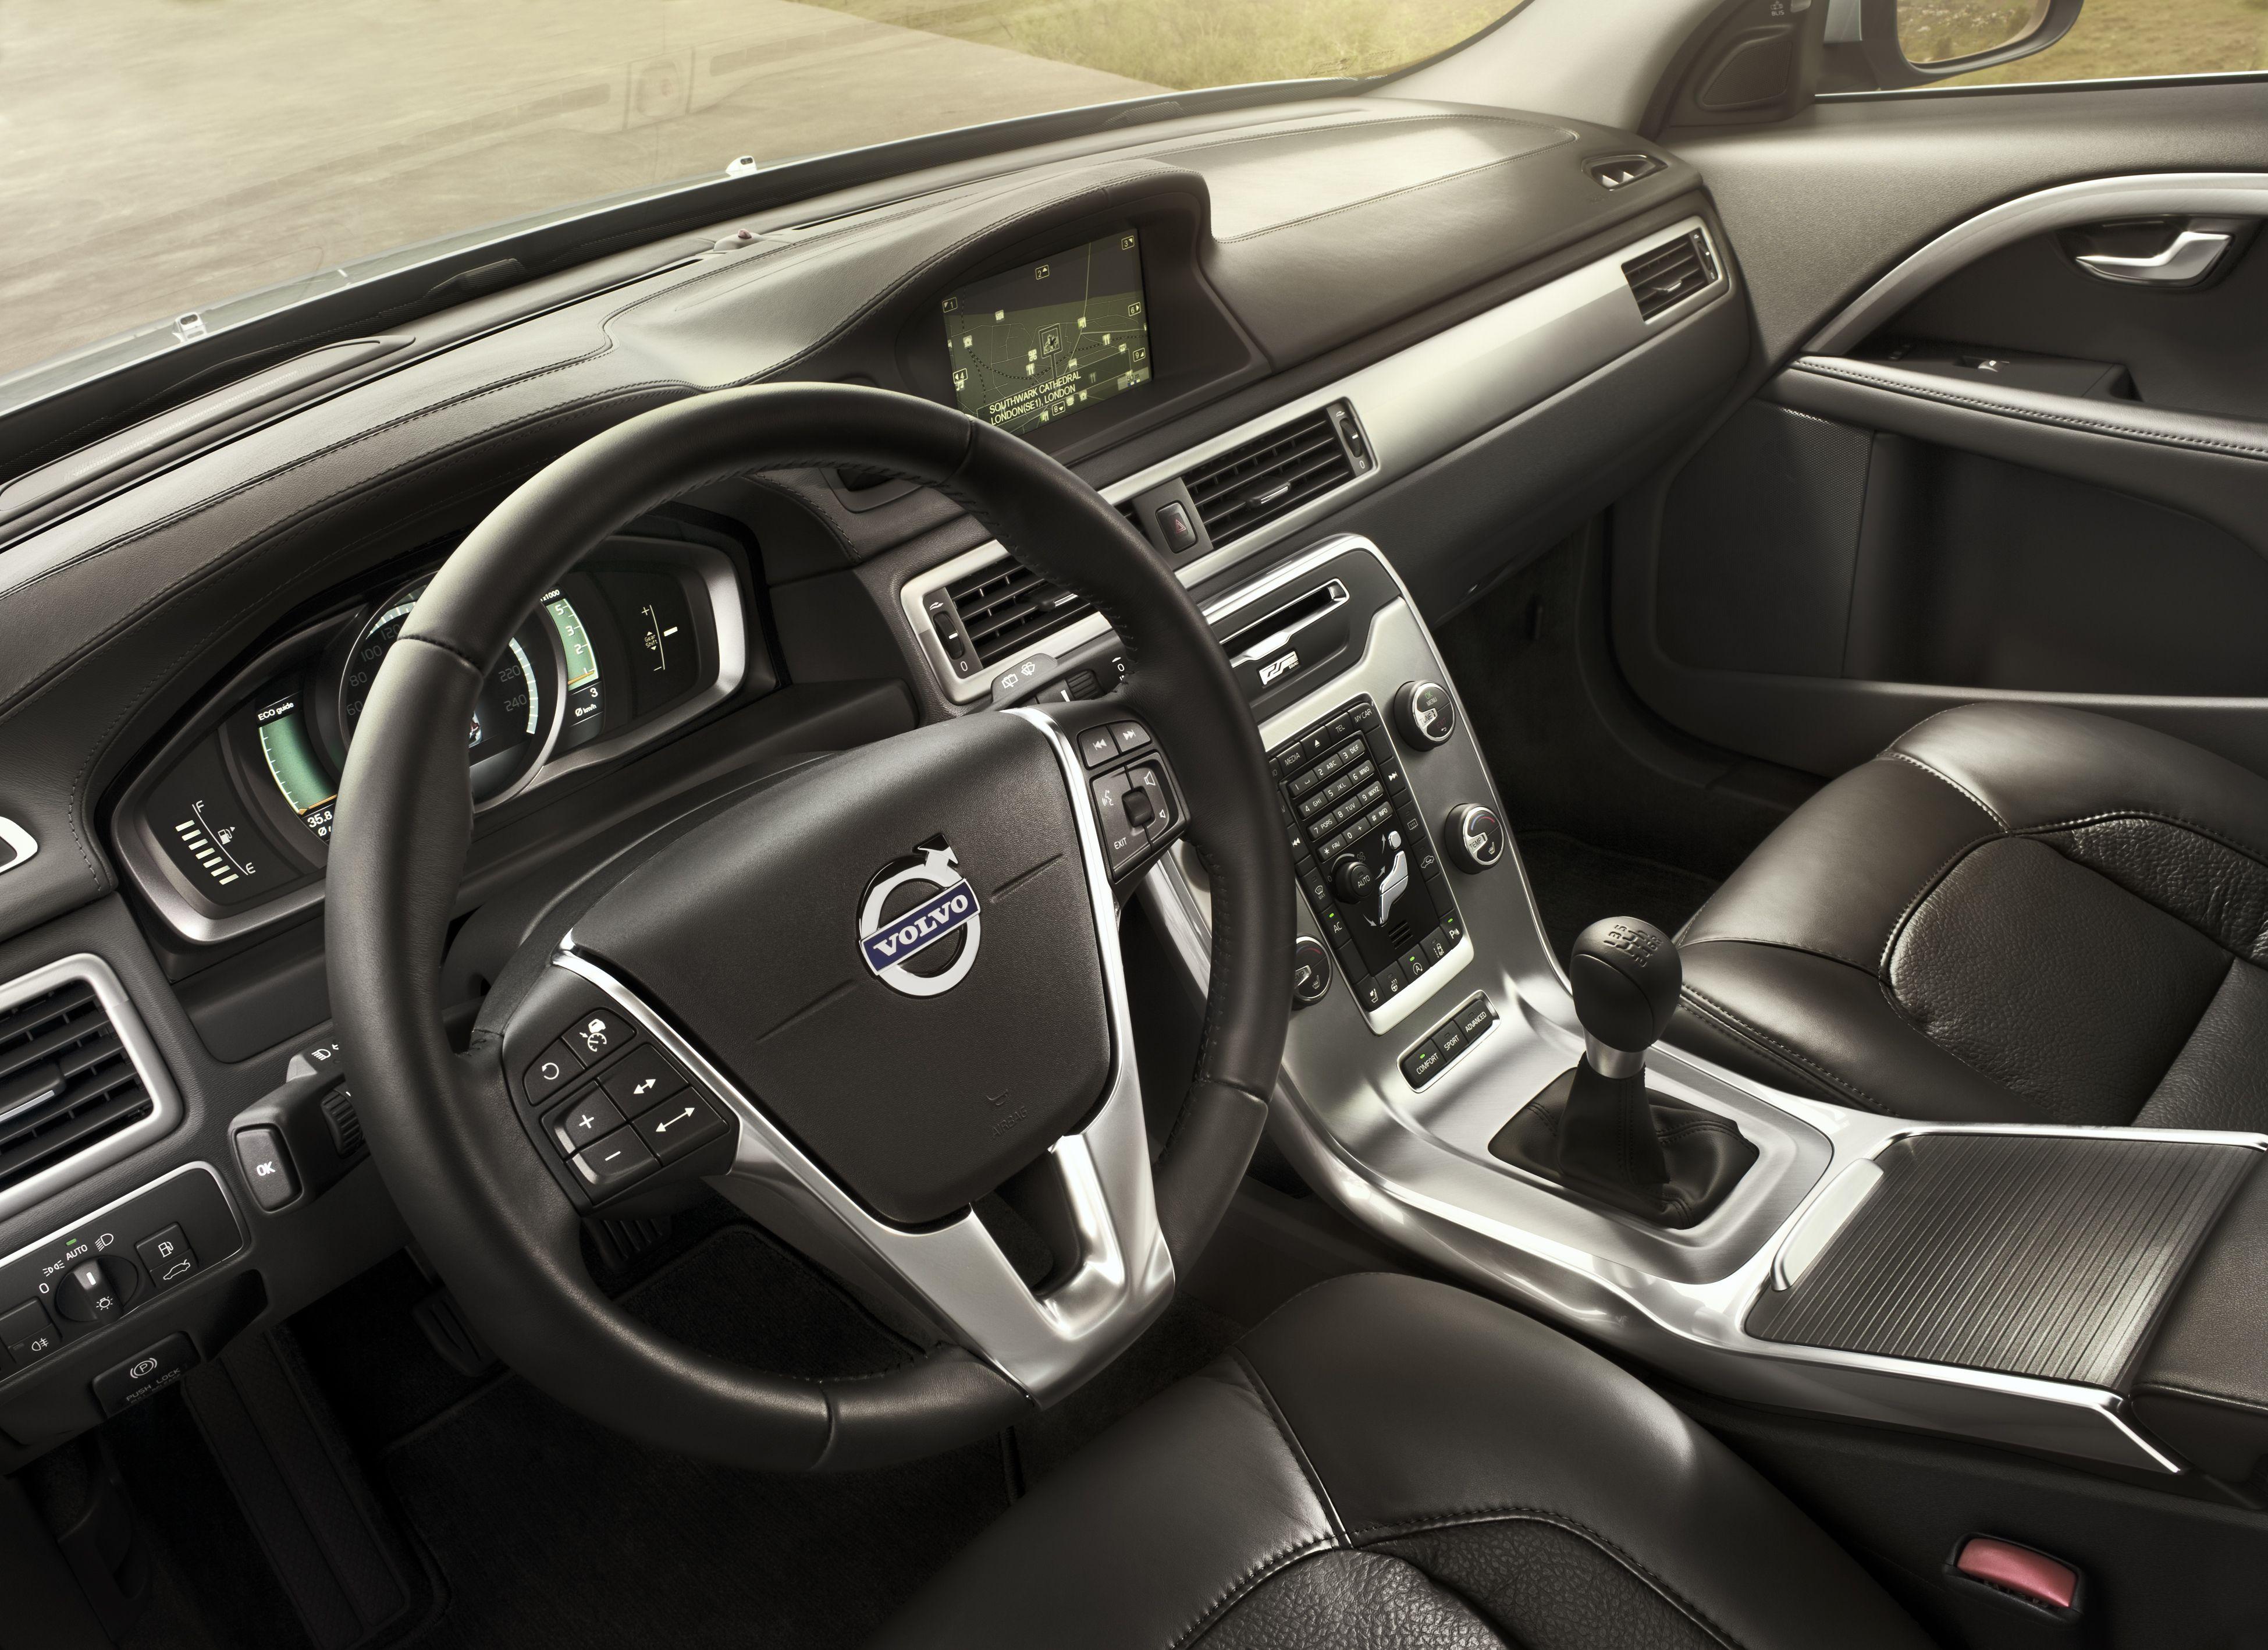 Volvo V70 interieur | Volvo V70 Bouwjaar 2014 | Pinterest | Volvo ...